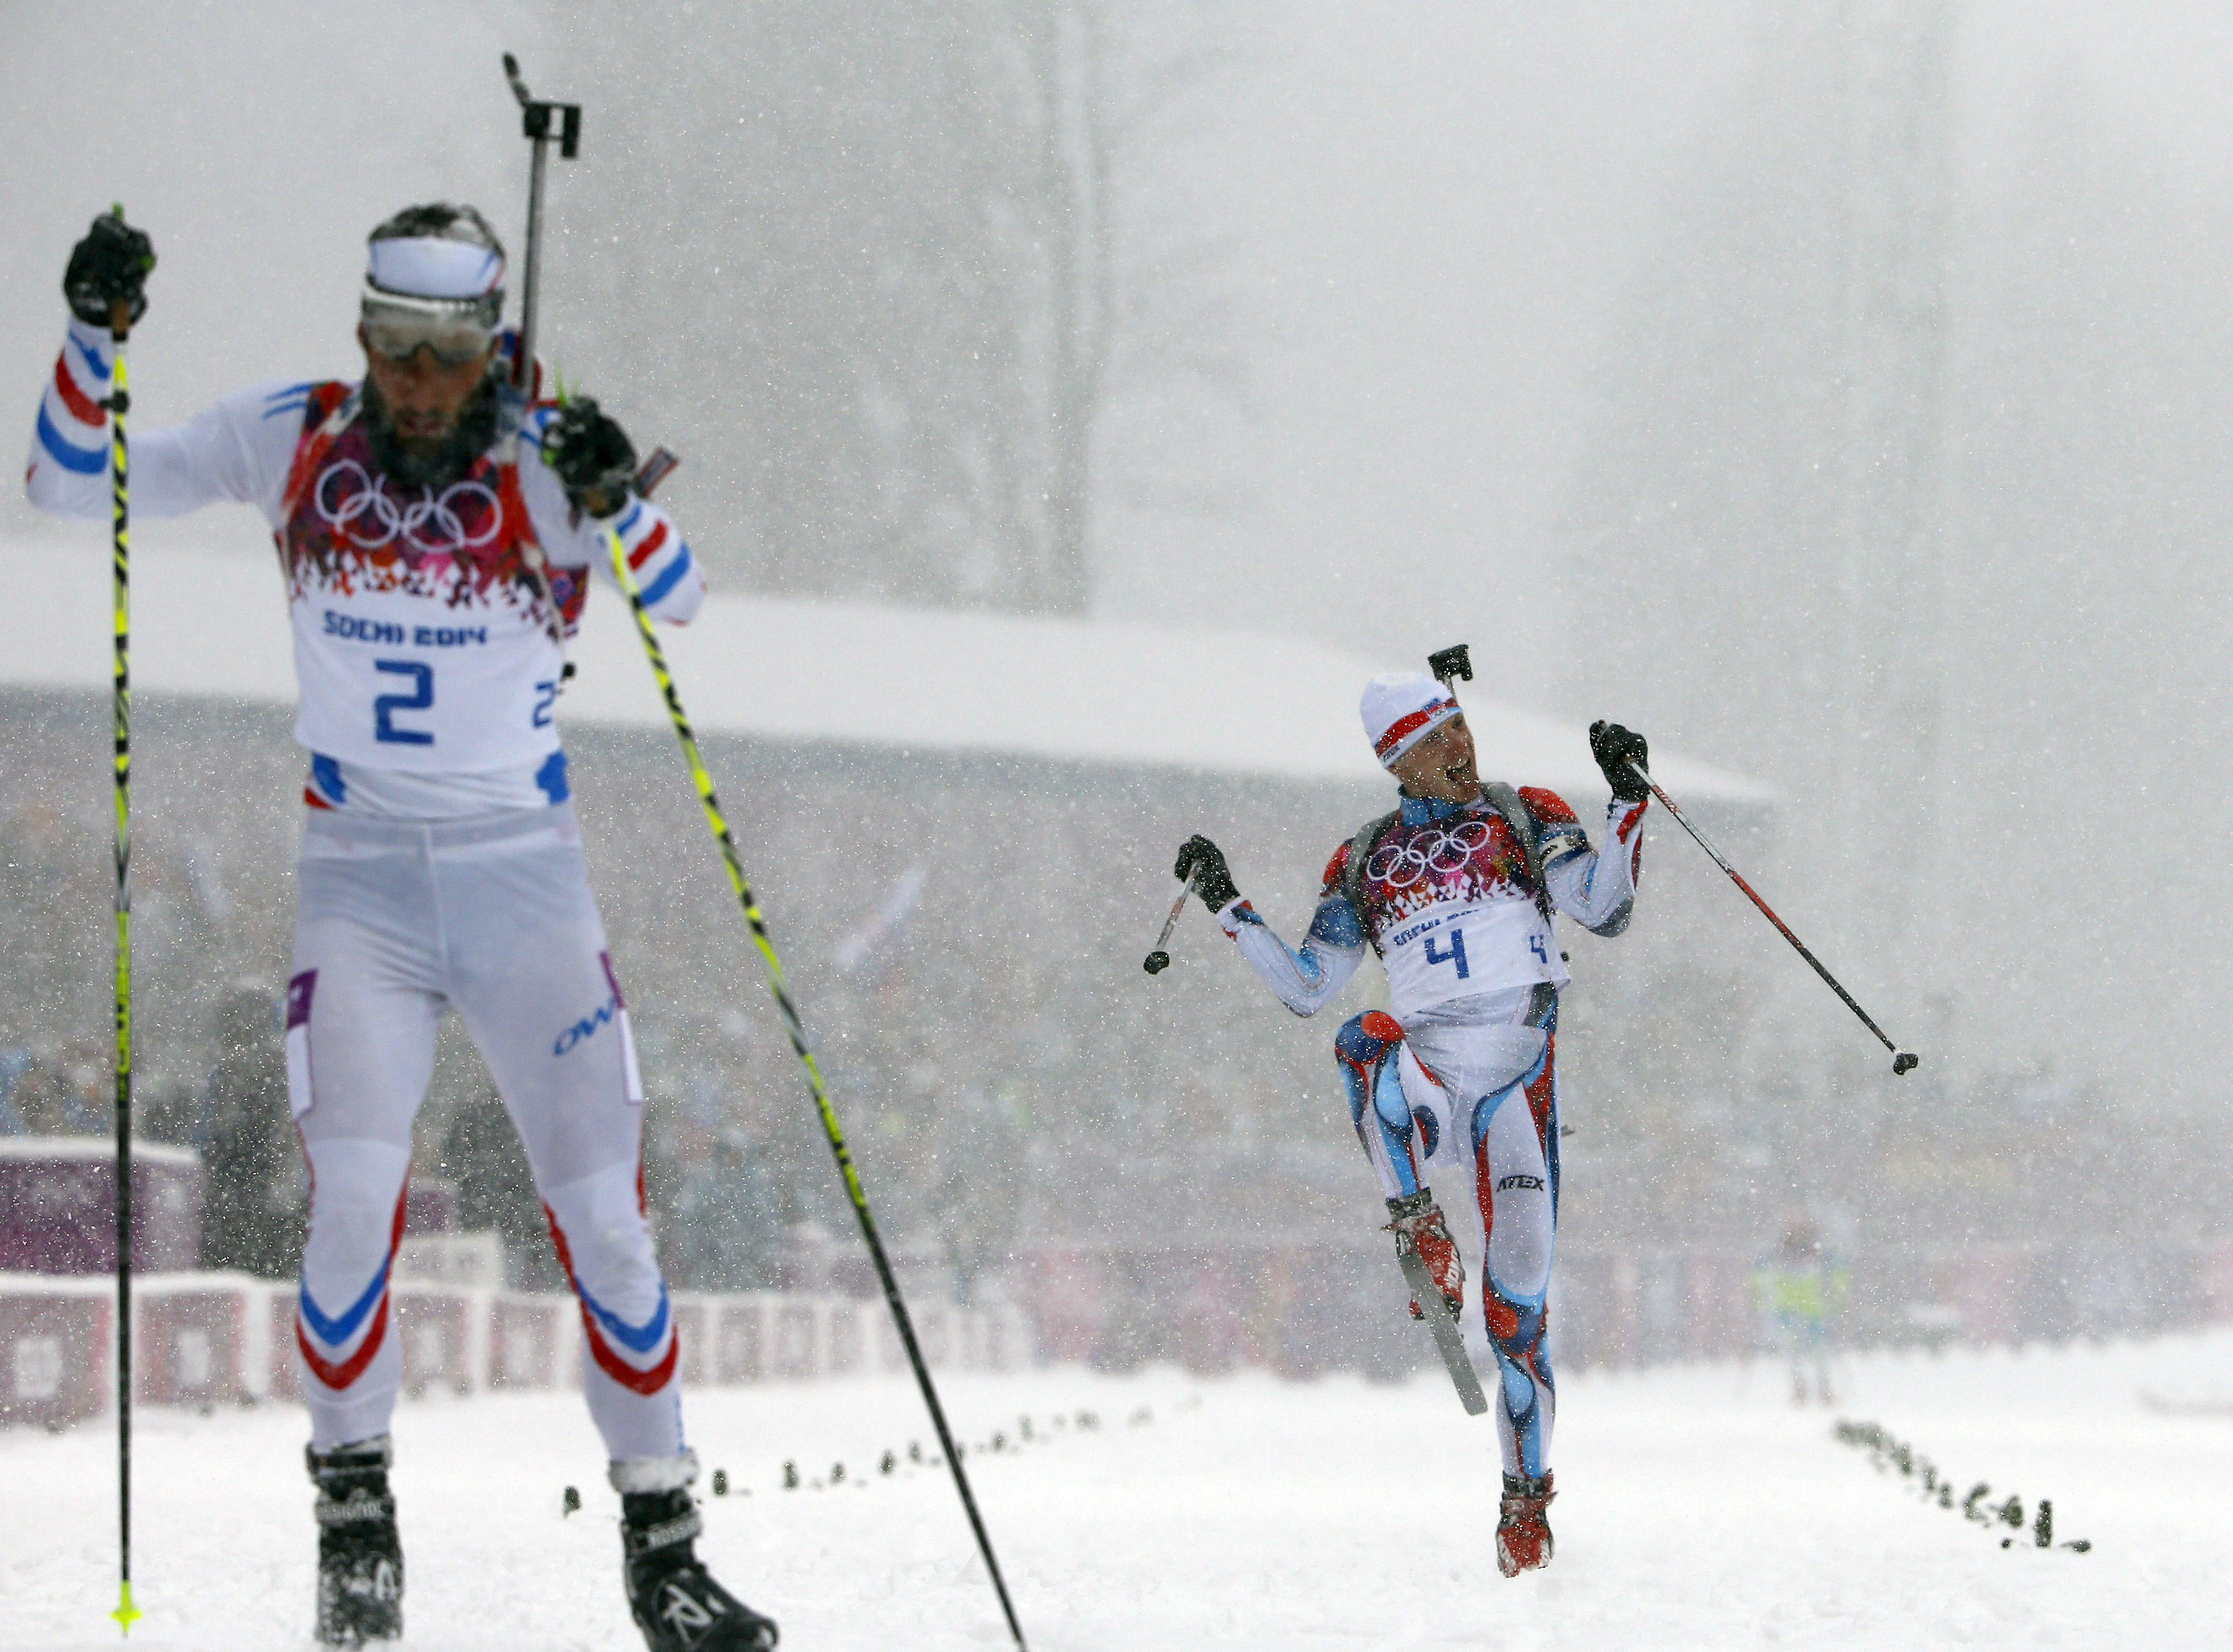 Czech Republic's Ondrej Moravec (R) reacts after crossing the finish line next to France's Martin Fourcade during the men's biathlon 15km mass start event.